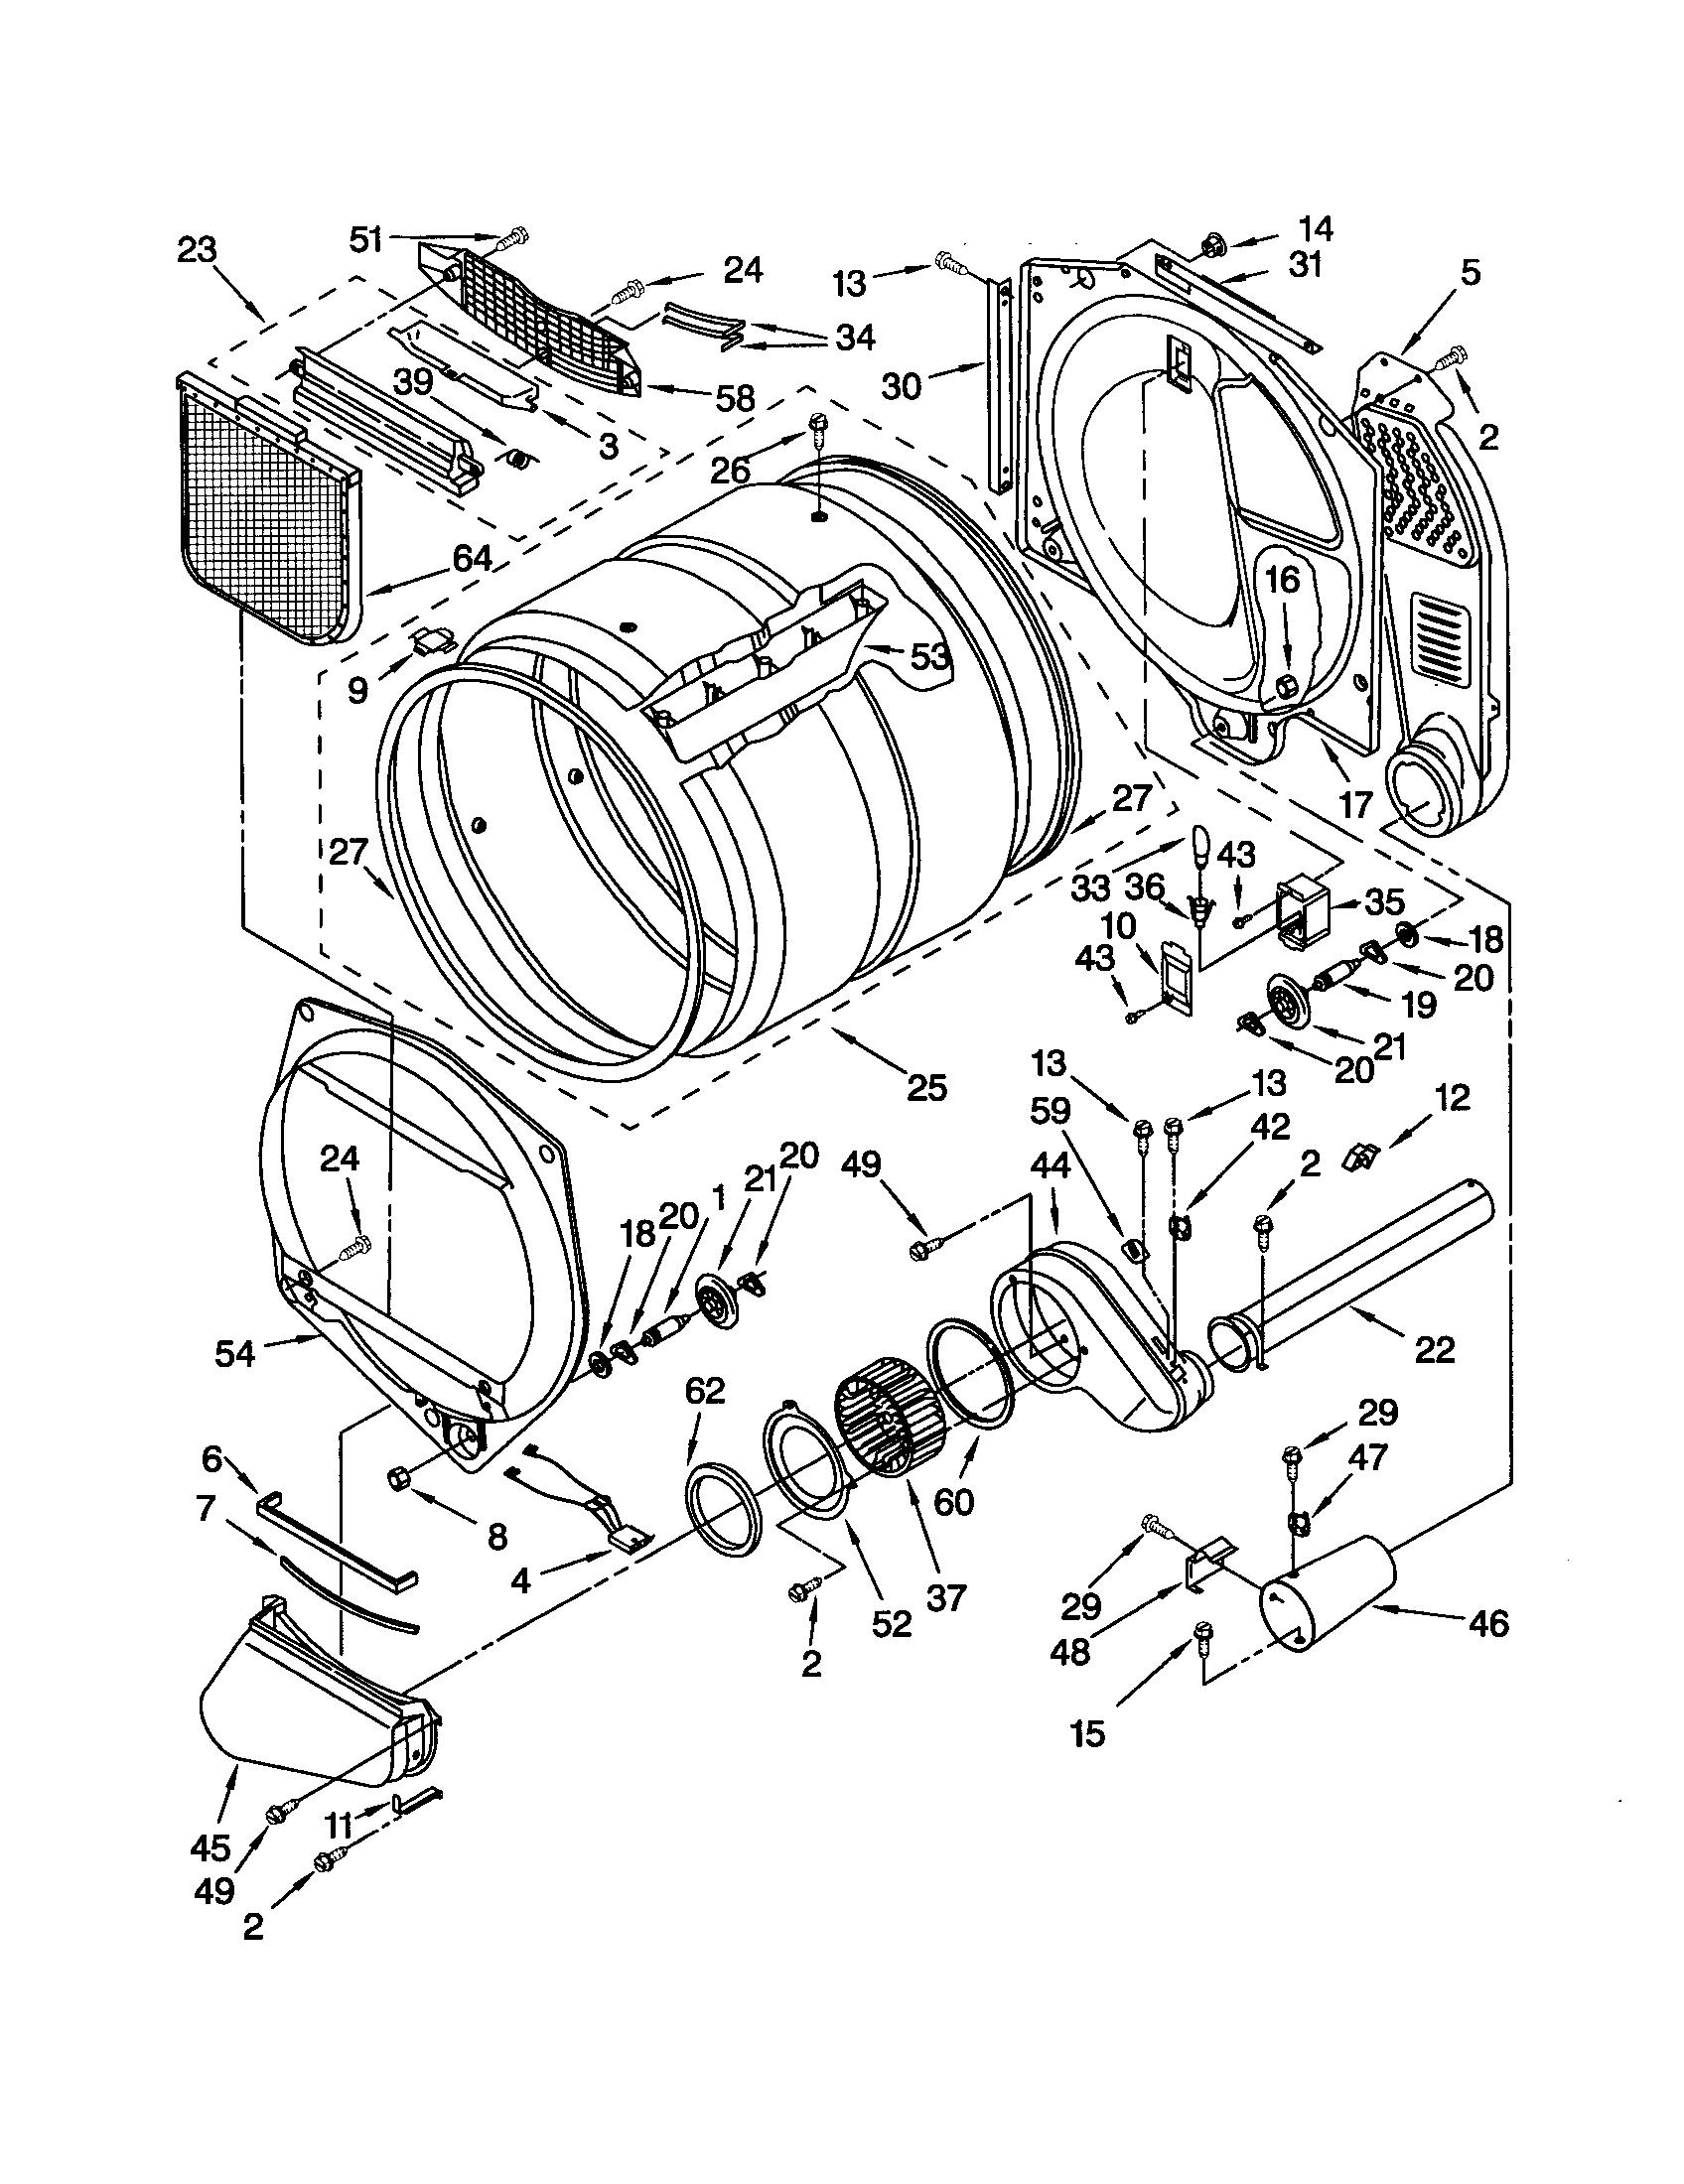 medium resolution of image result for kenmore elite he3 gas dryer wiring diagram diy image result for kenmore elite